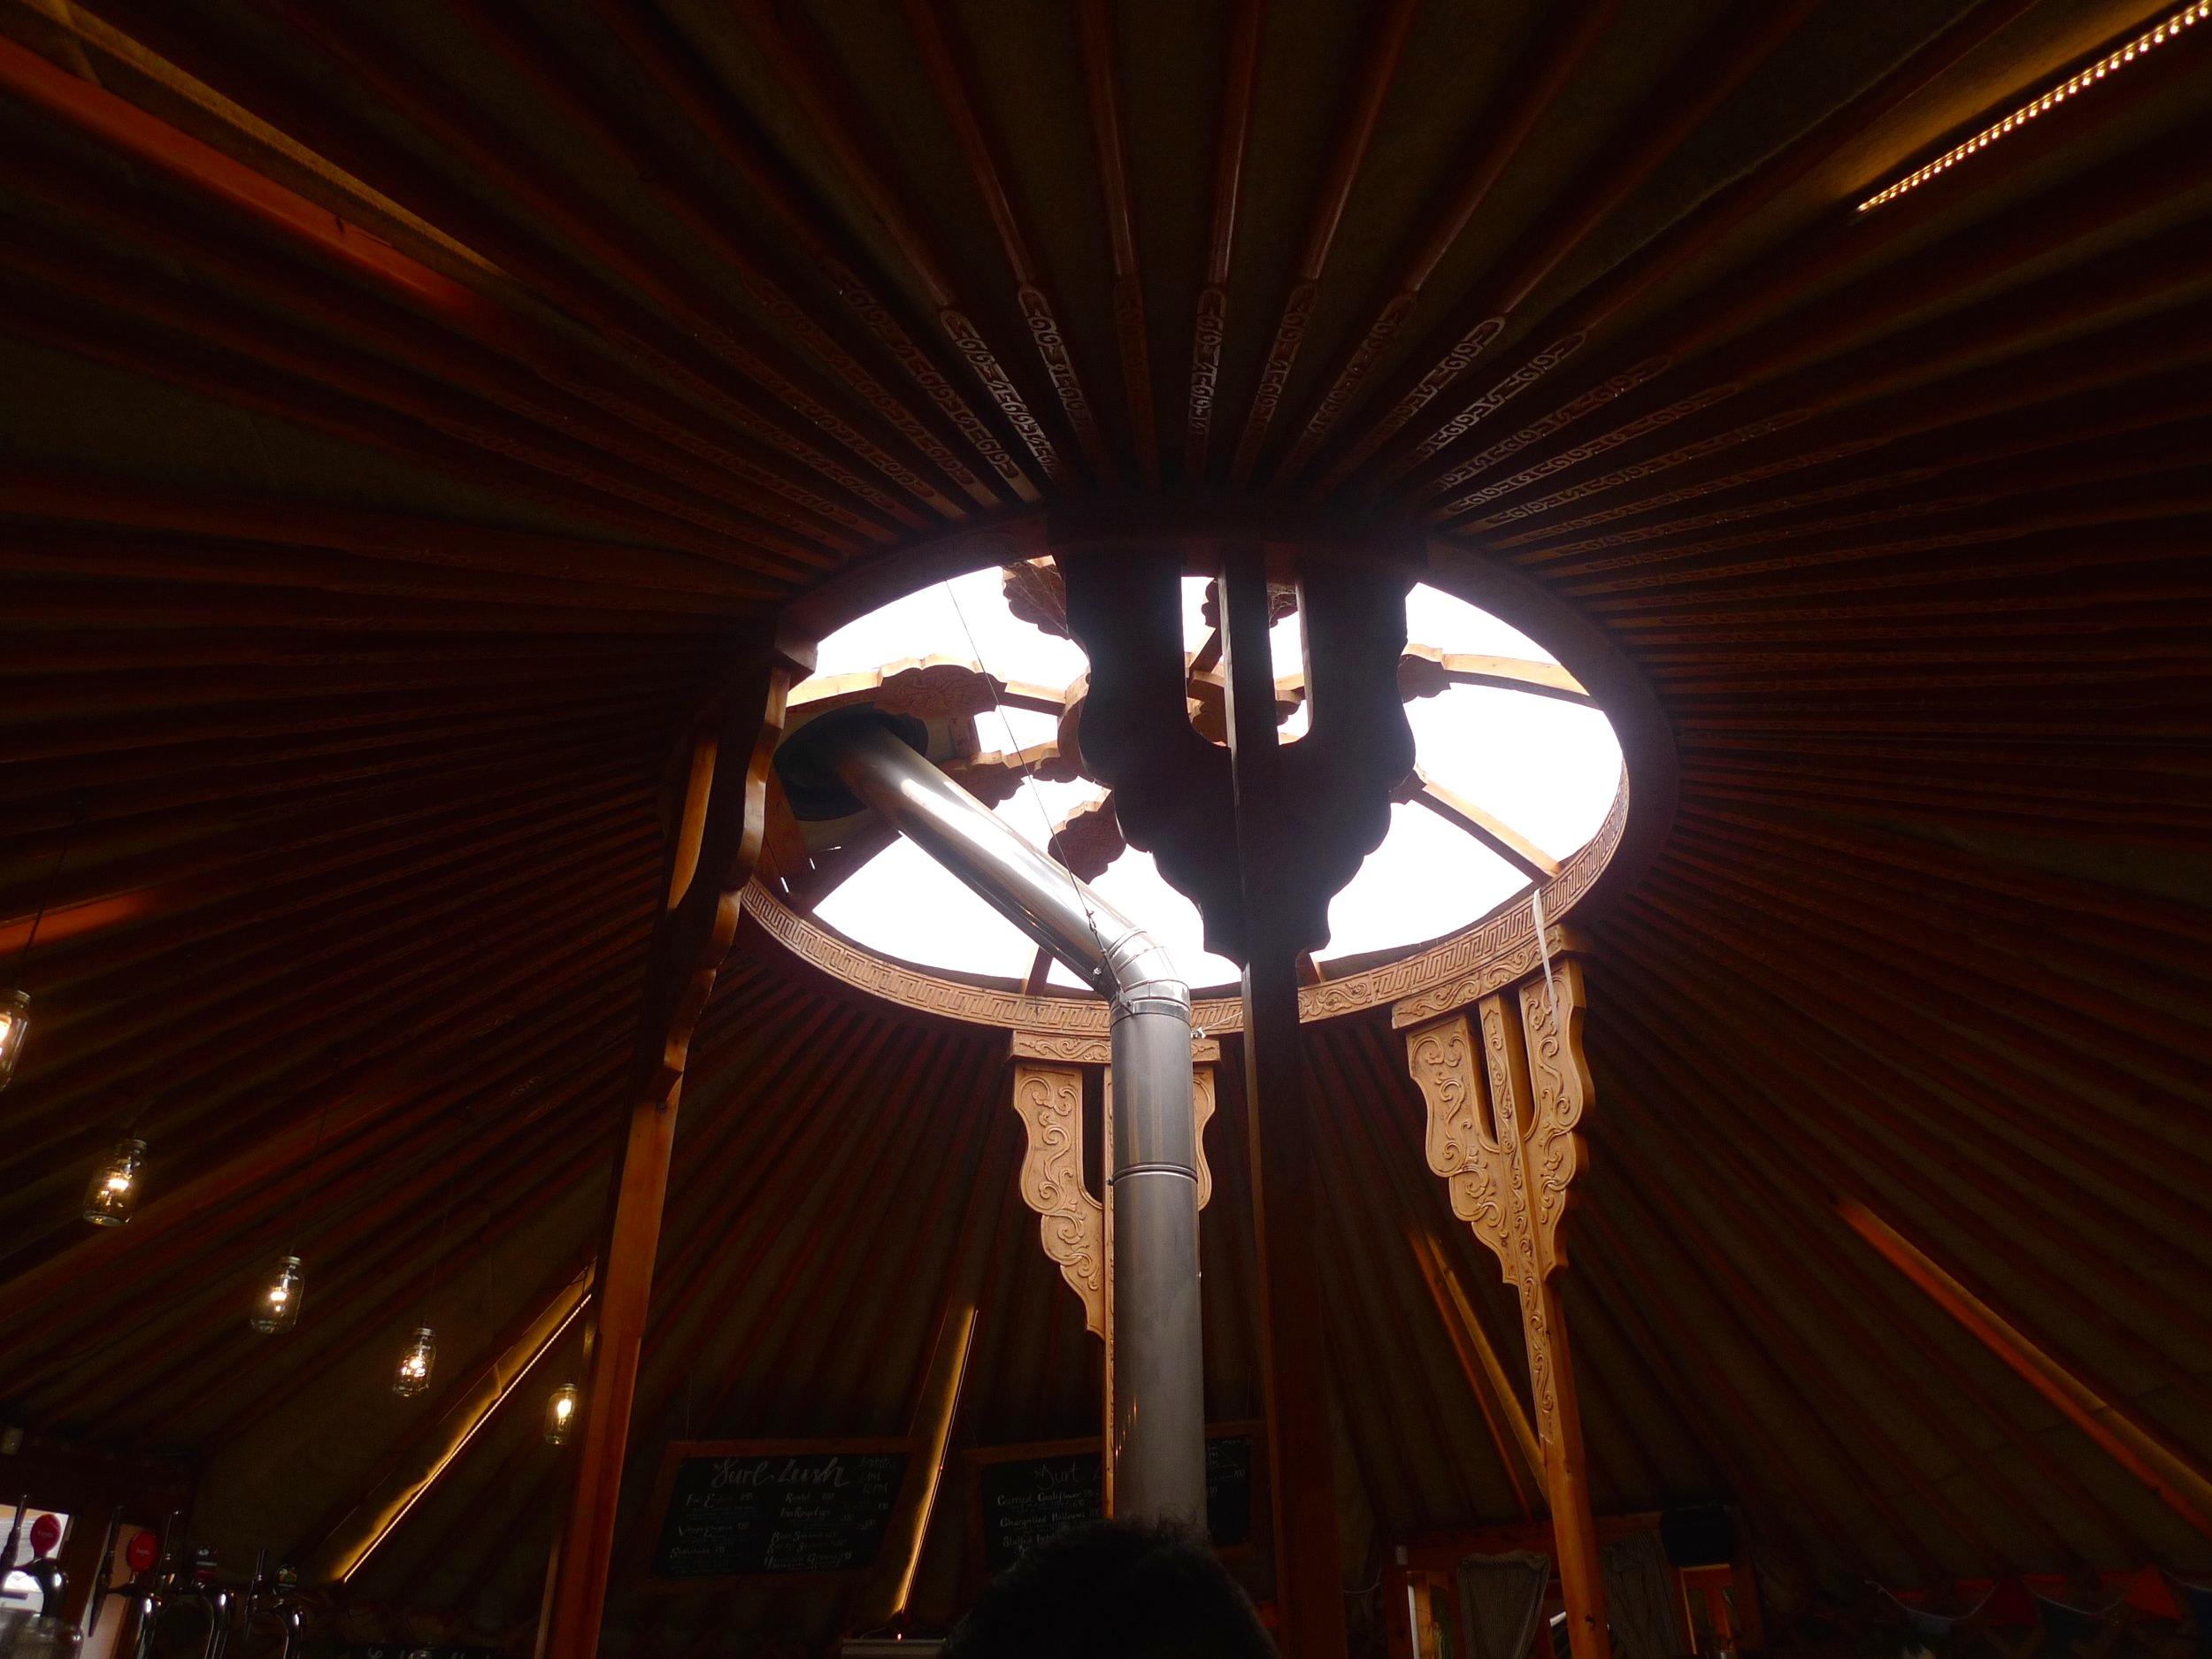 Yurt Lush